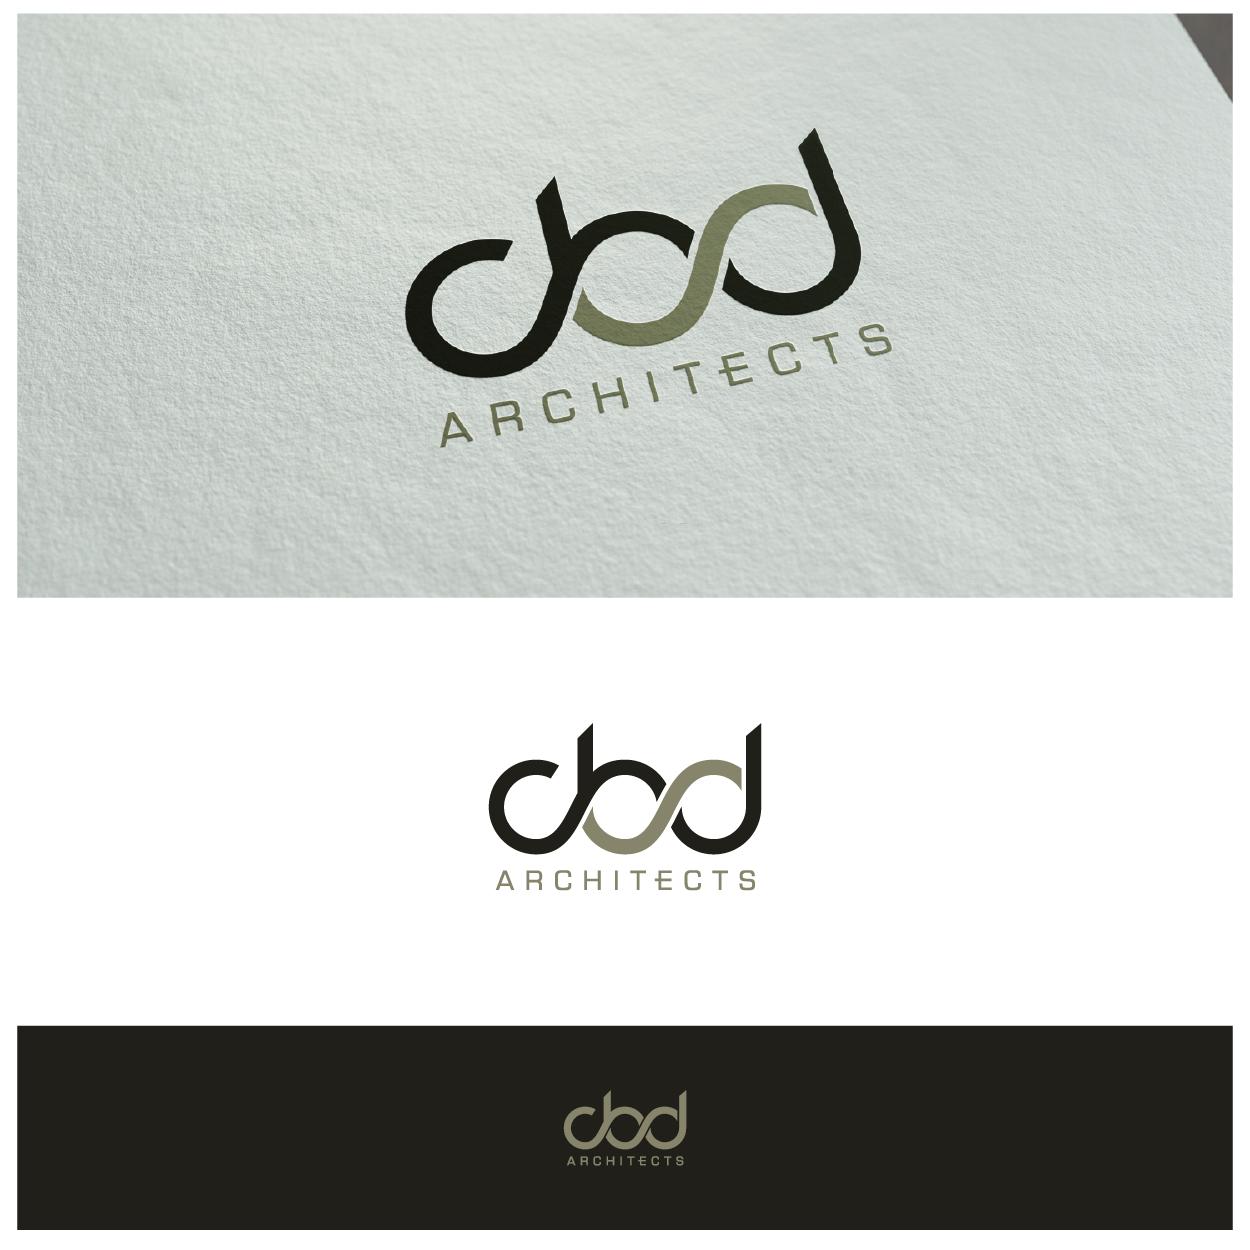 serious modern architecture logo design for cbd